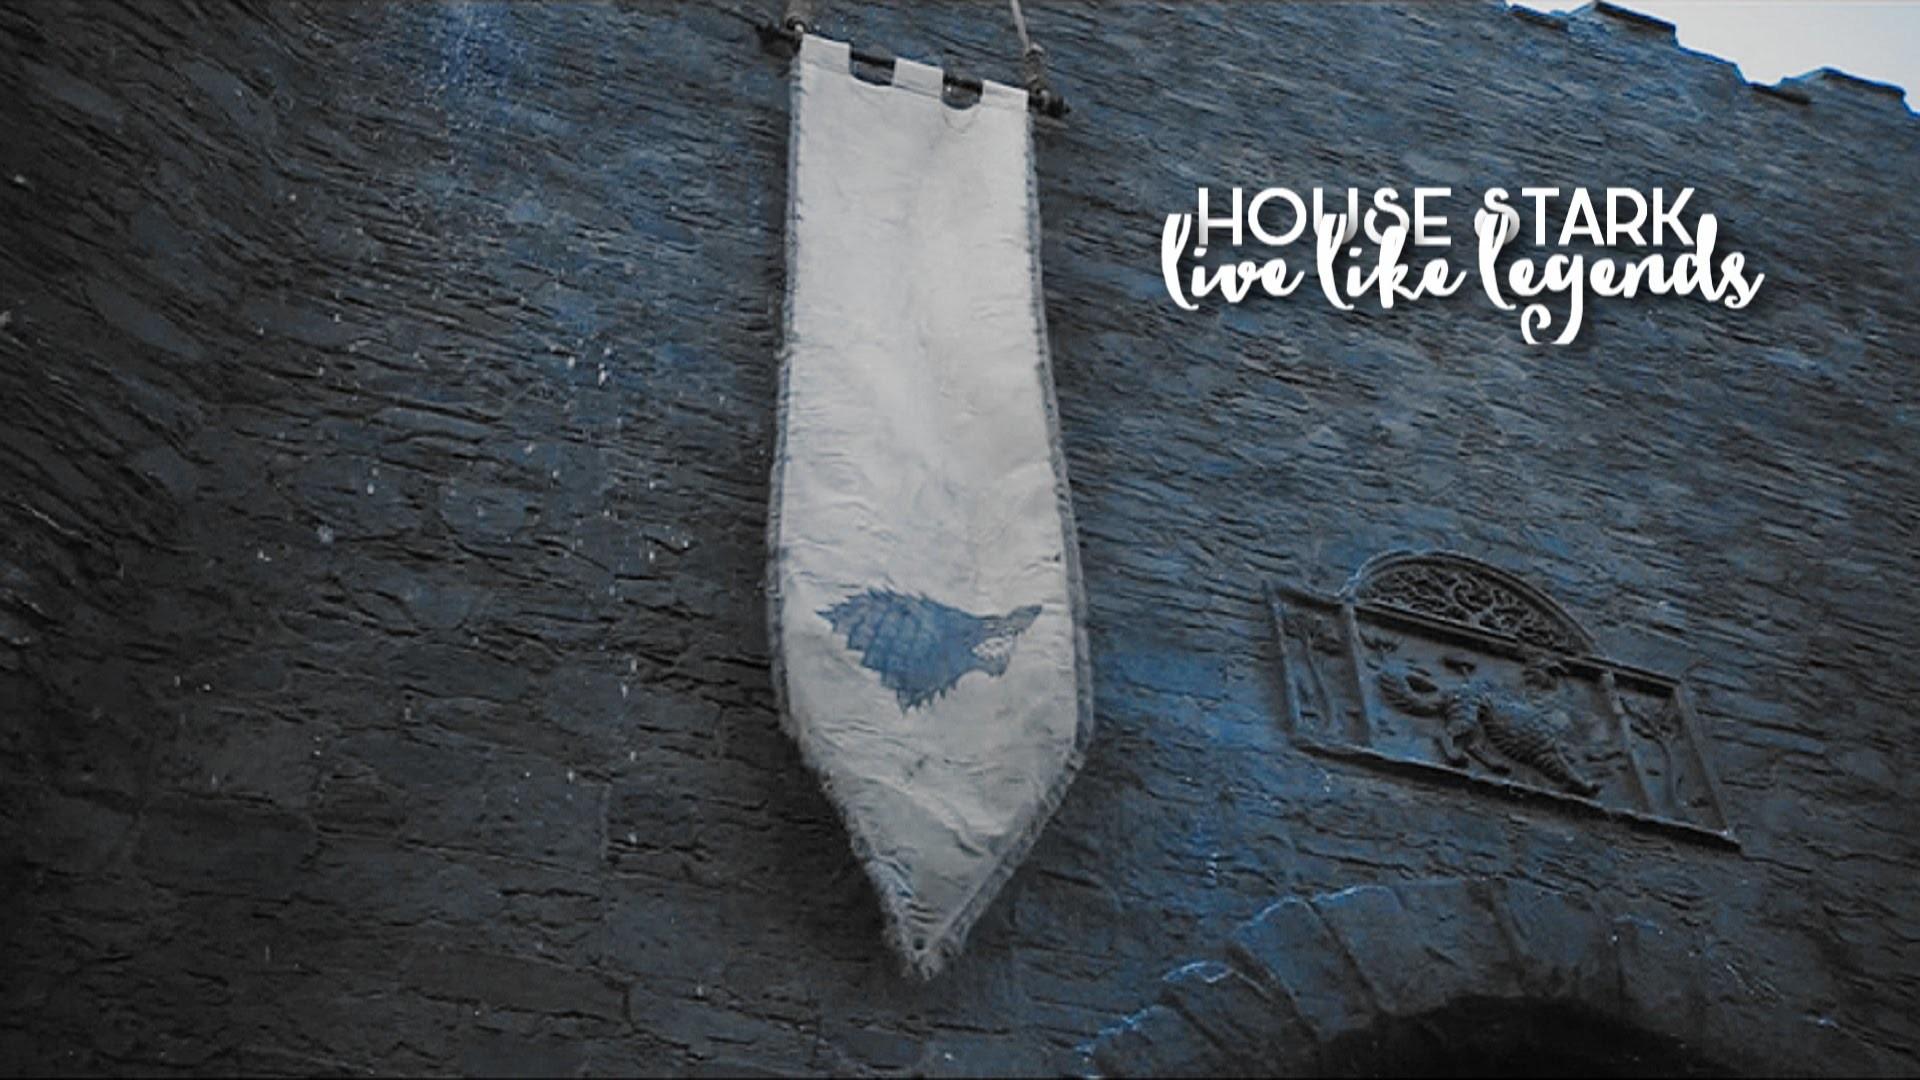 Res: 1920x1080, house stark || live like legends